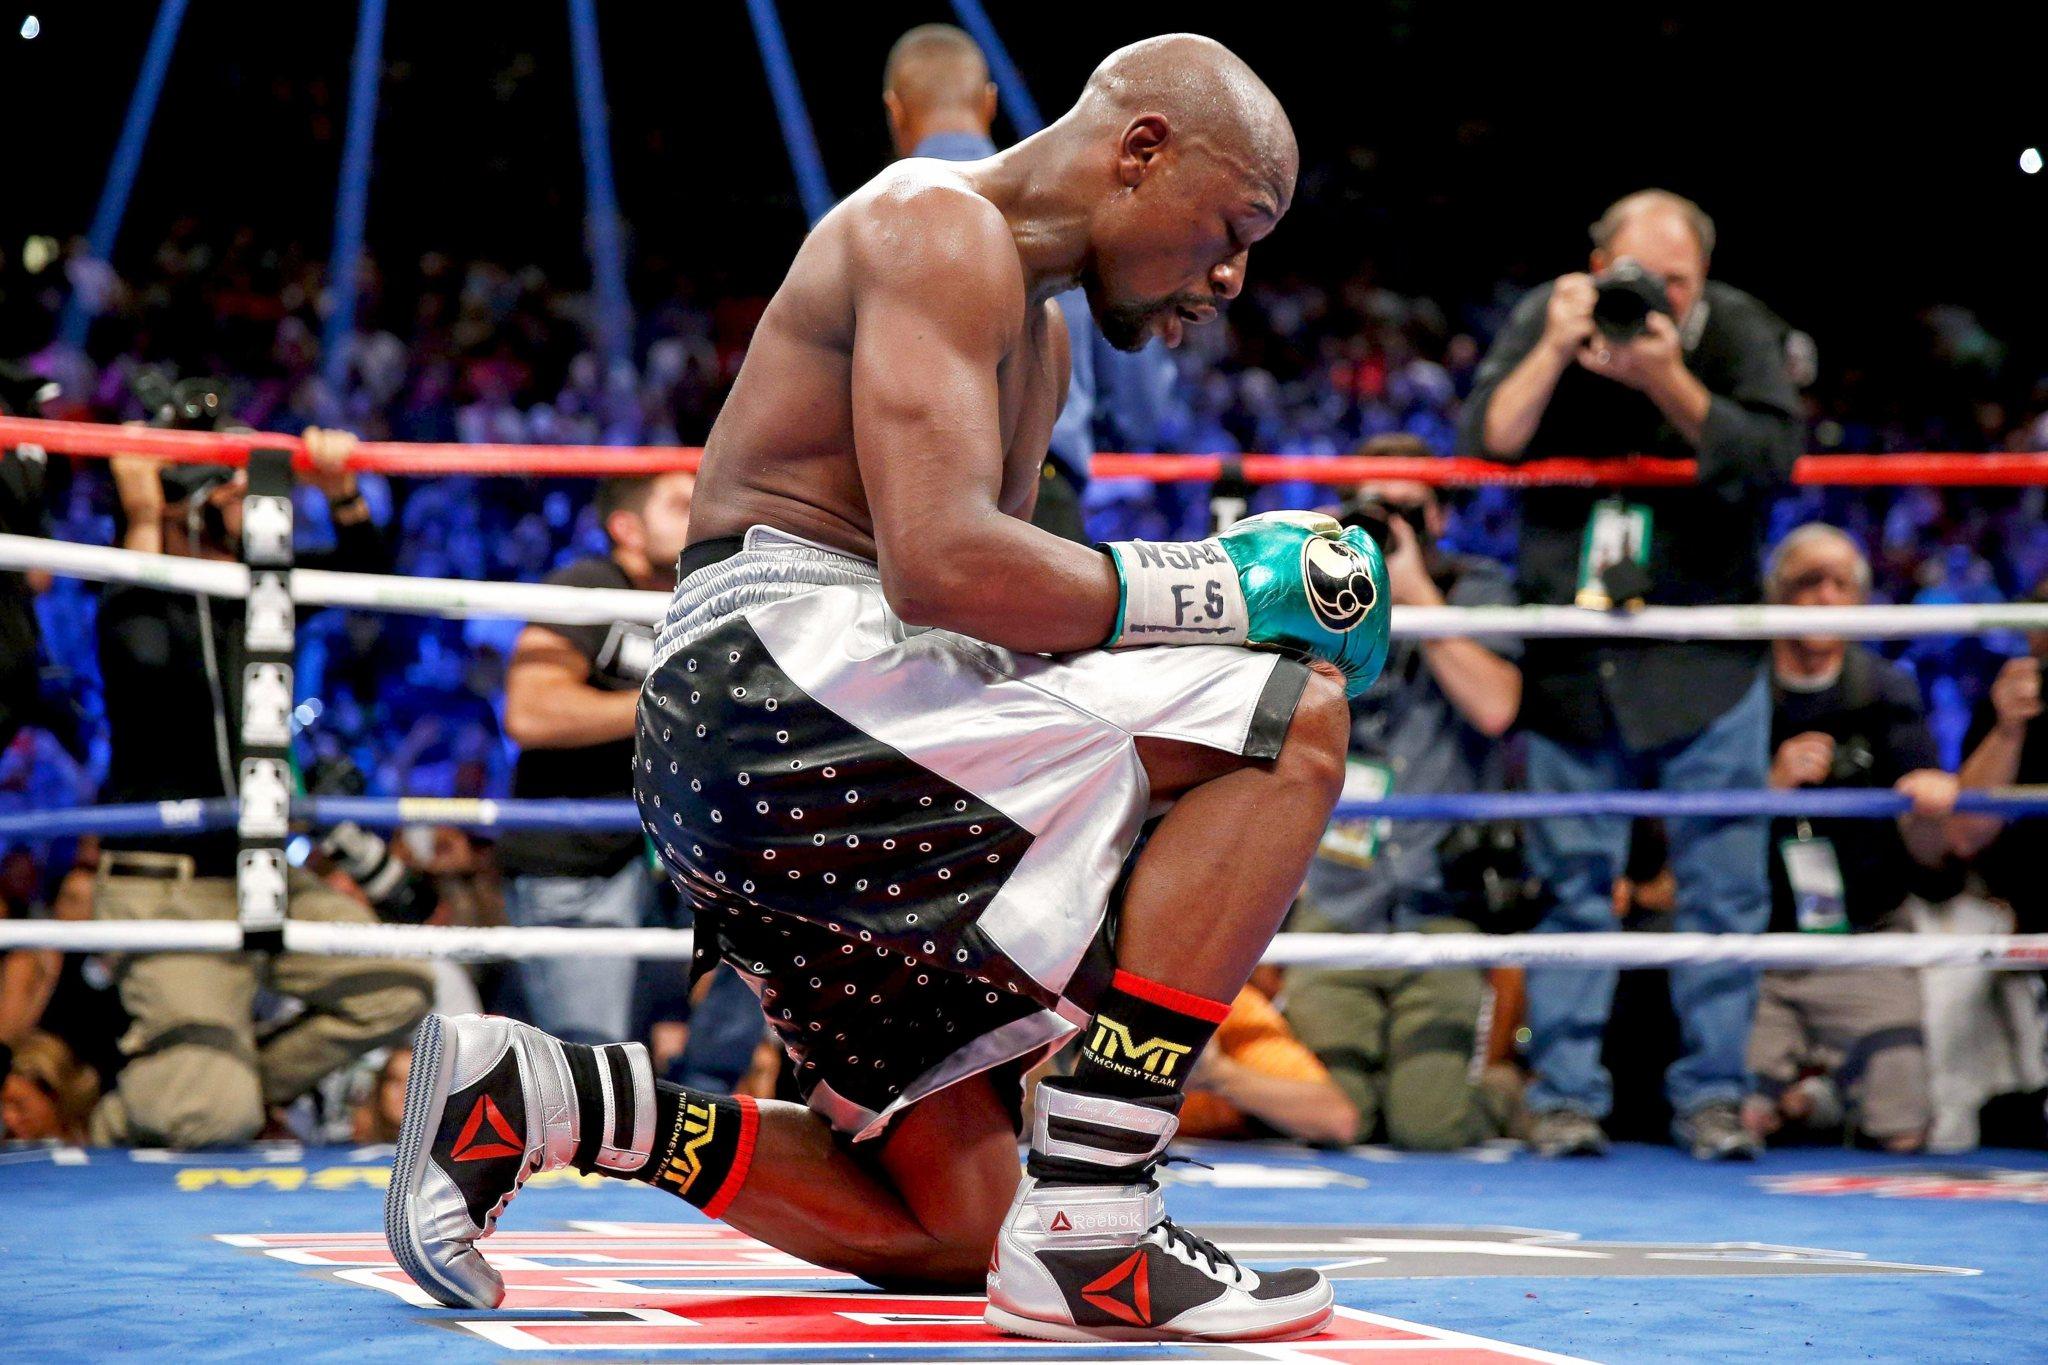 El boxeador Floyd Mayweather